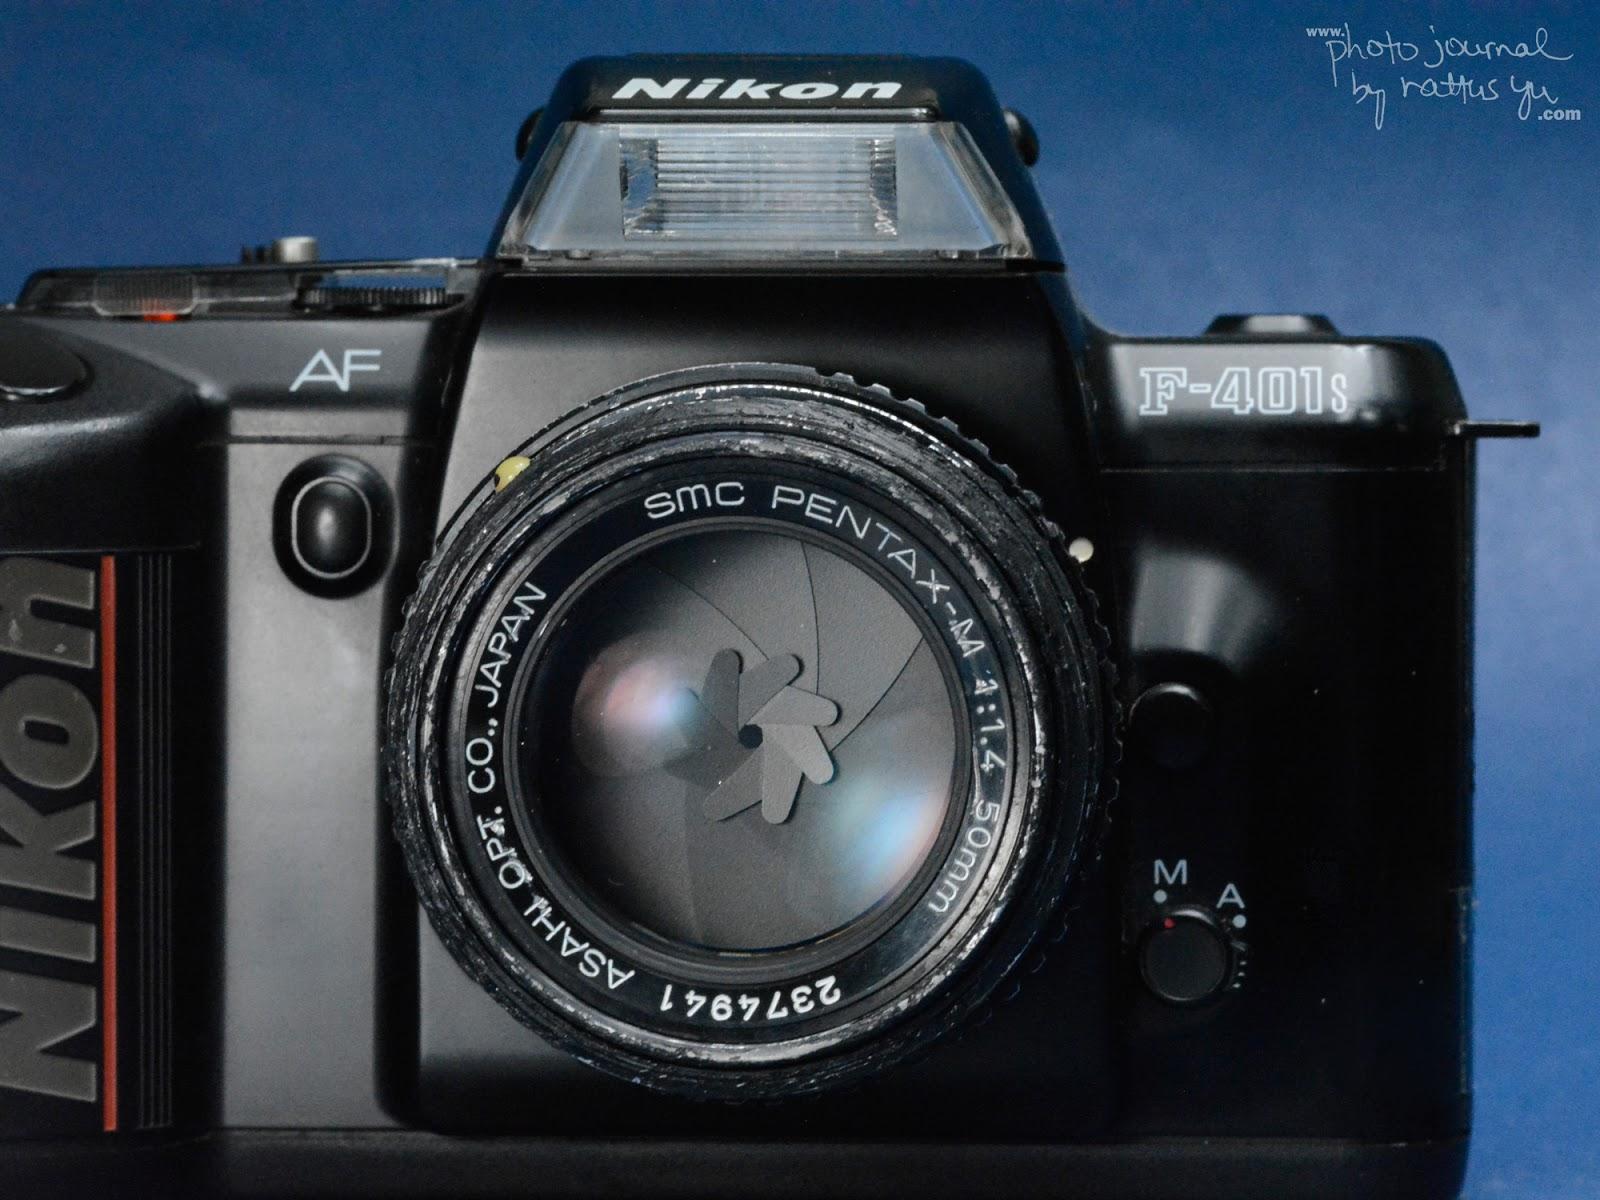 Nikkor 135/3.5, Pentax 50/1.4, Olympus 50/1.8 and Vivitar 3x Teleconverter